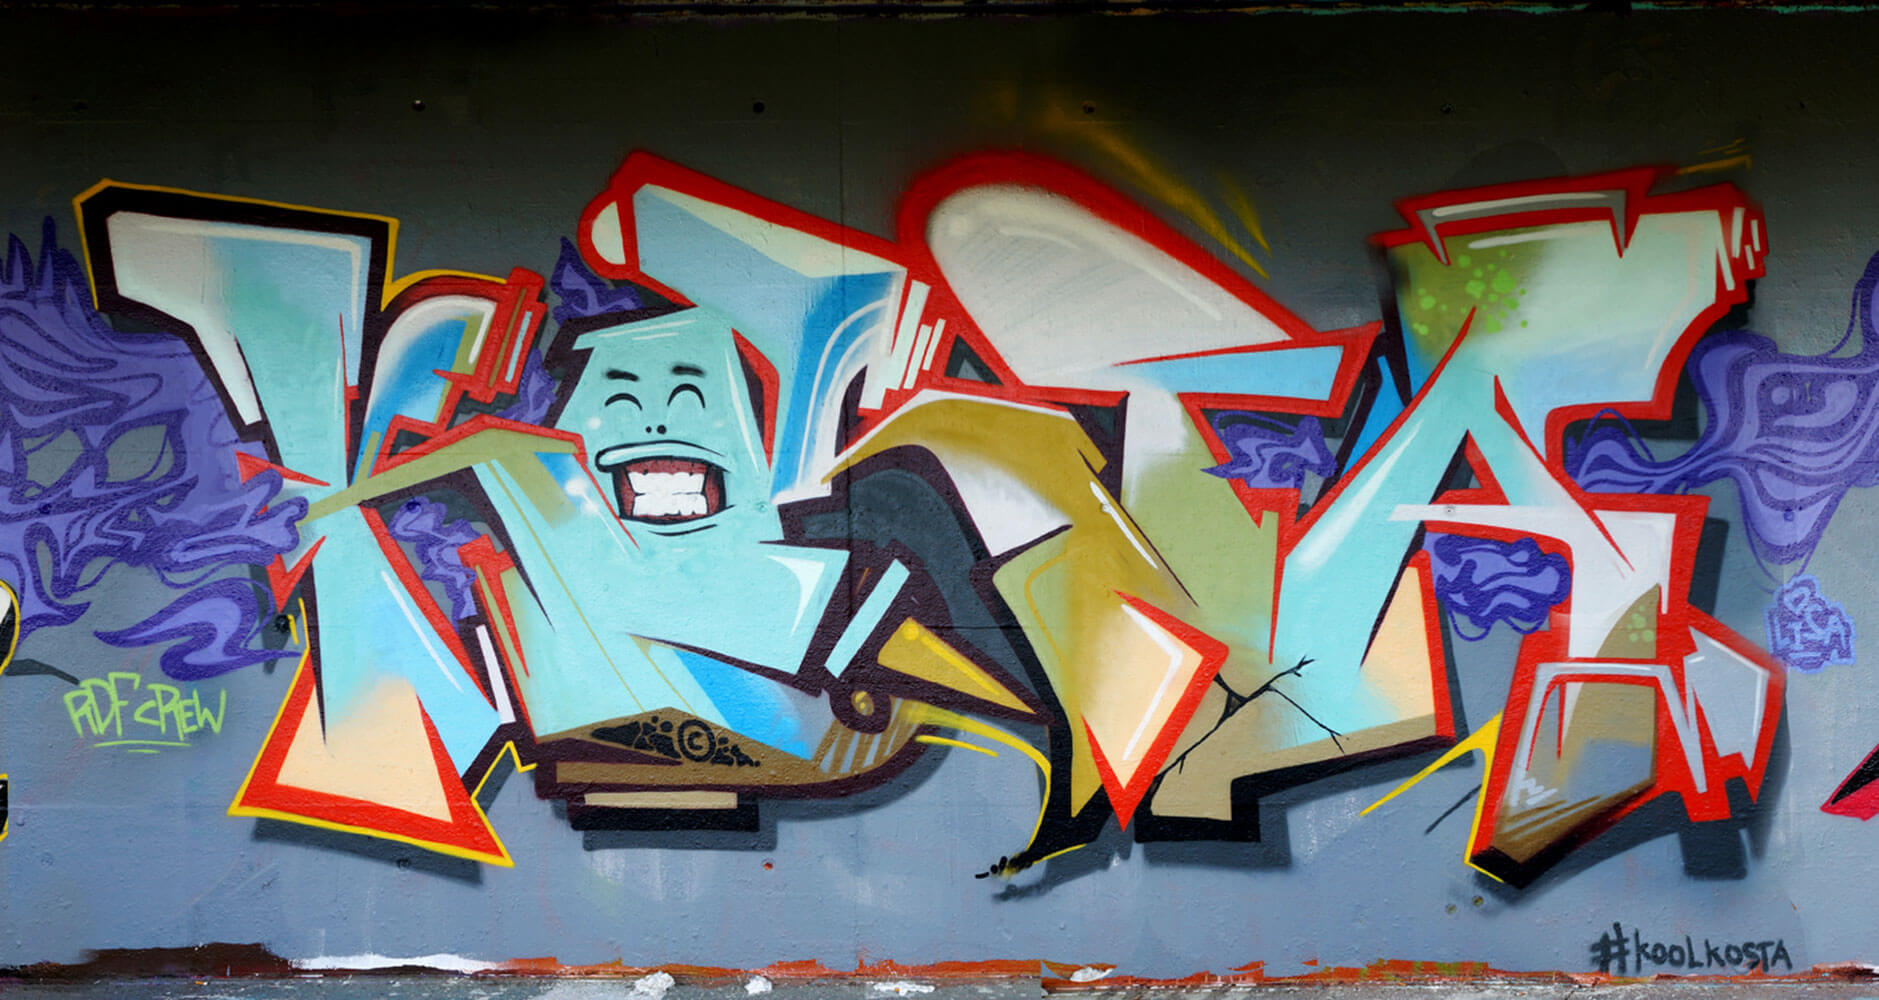 Kosta Graffiti by Max Kosta in Wettingen 2014